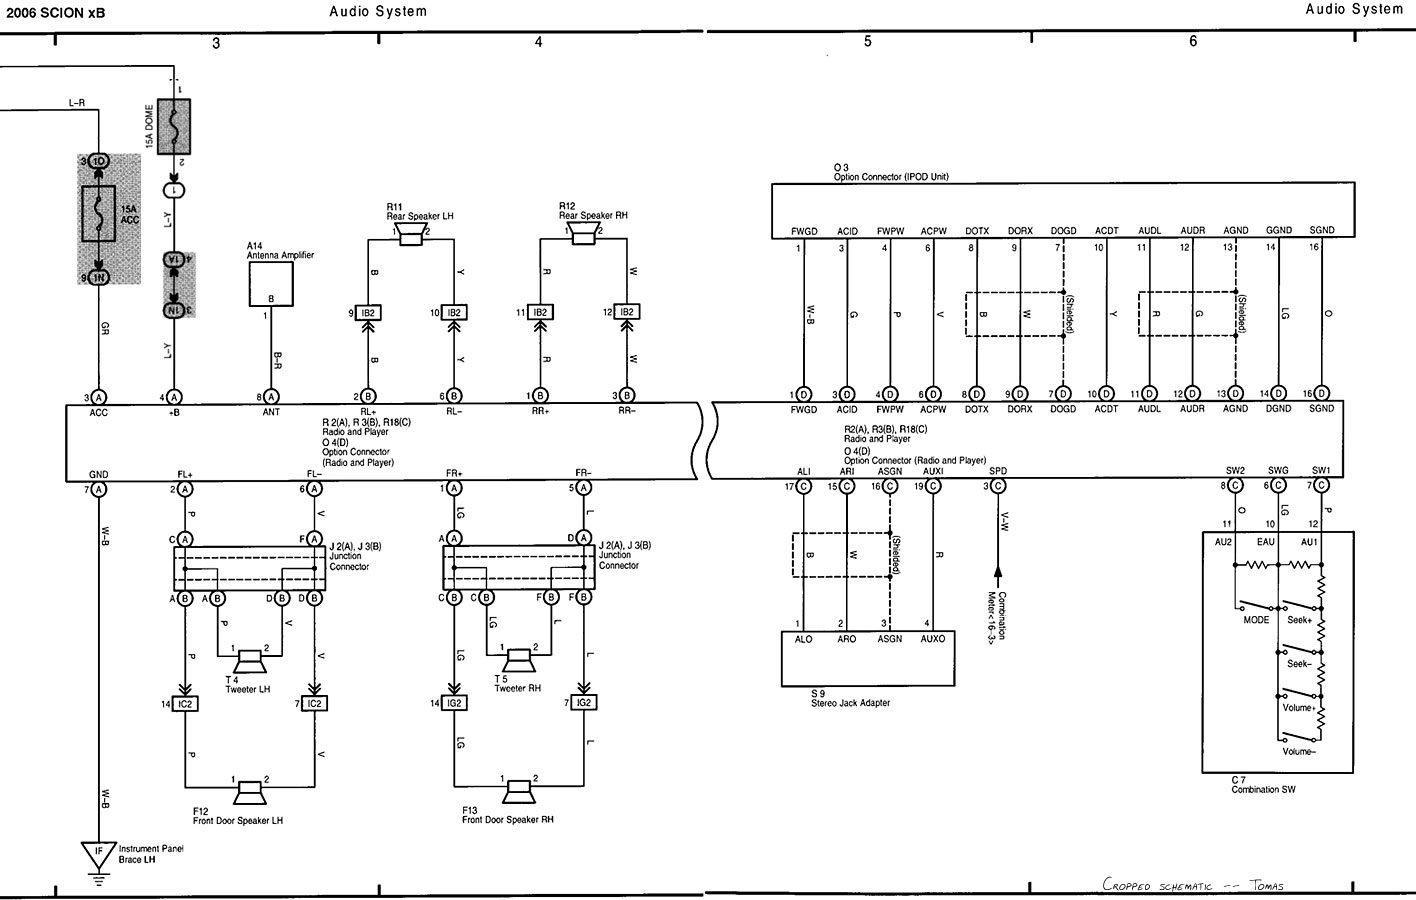 2005 Gmc Envoy Stereo Wiring Harness Solutions Radio Diagram